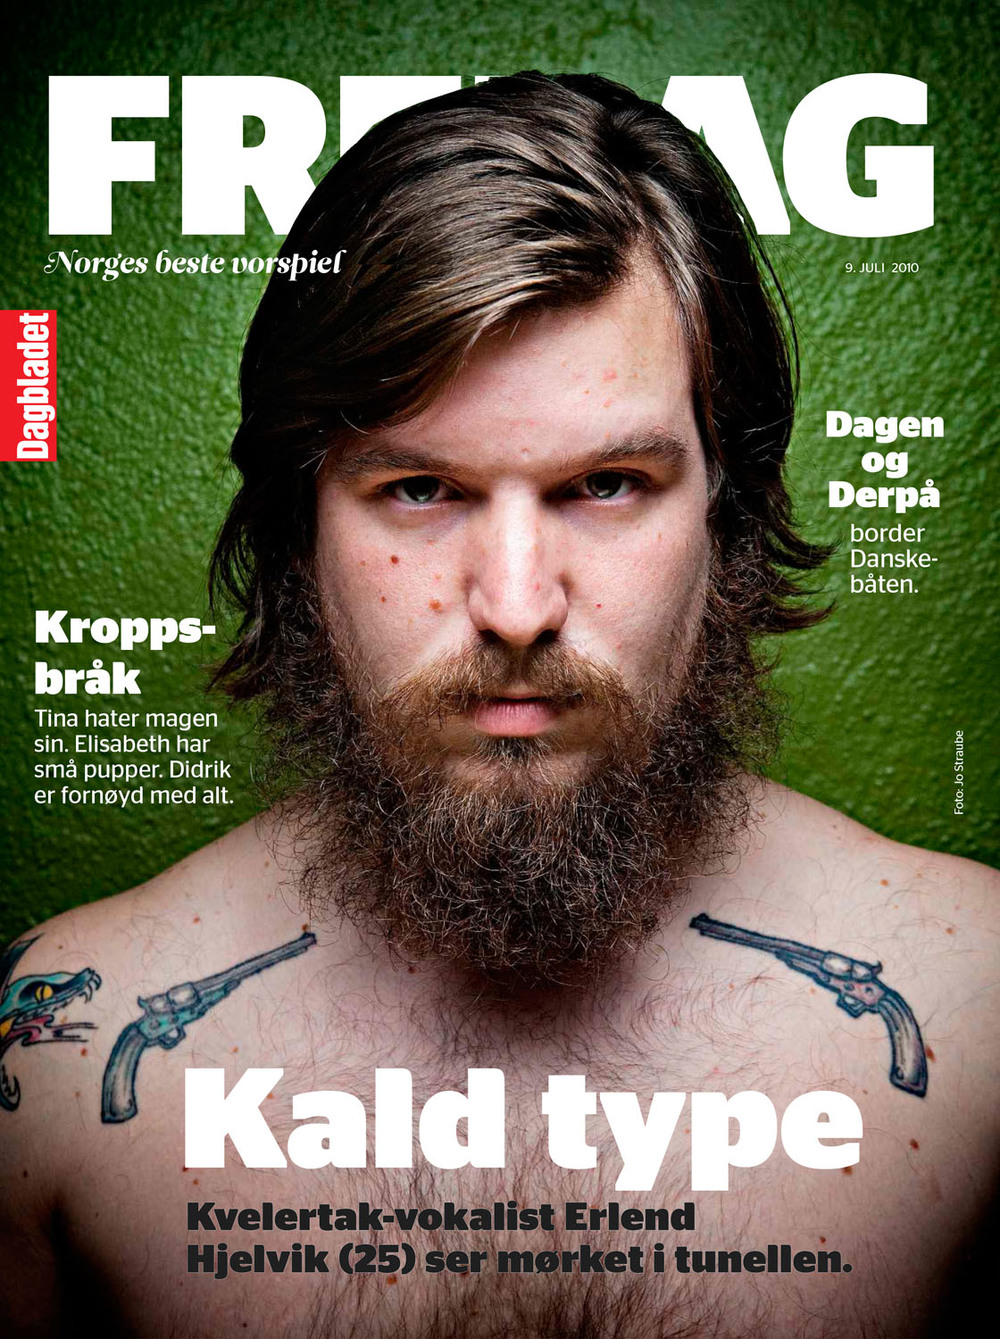 Dagbladet Fredag 9.7.2010